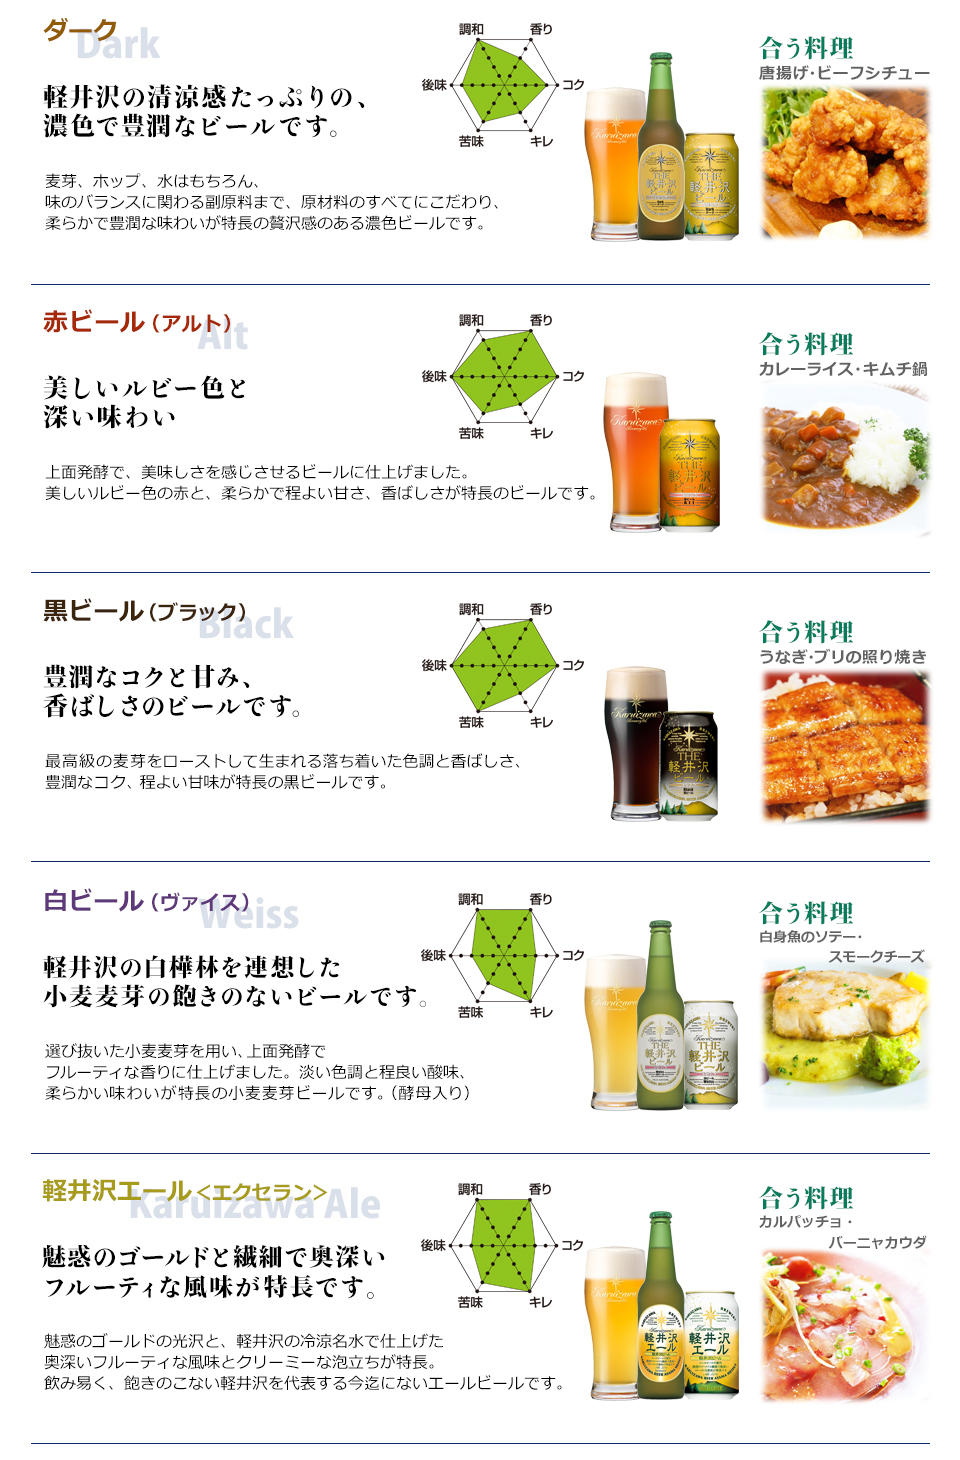 THE軽井沢ビール味わいチャートマップ